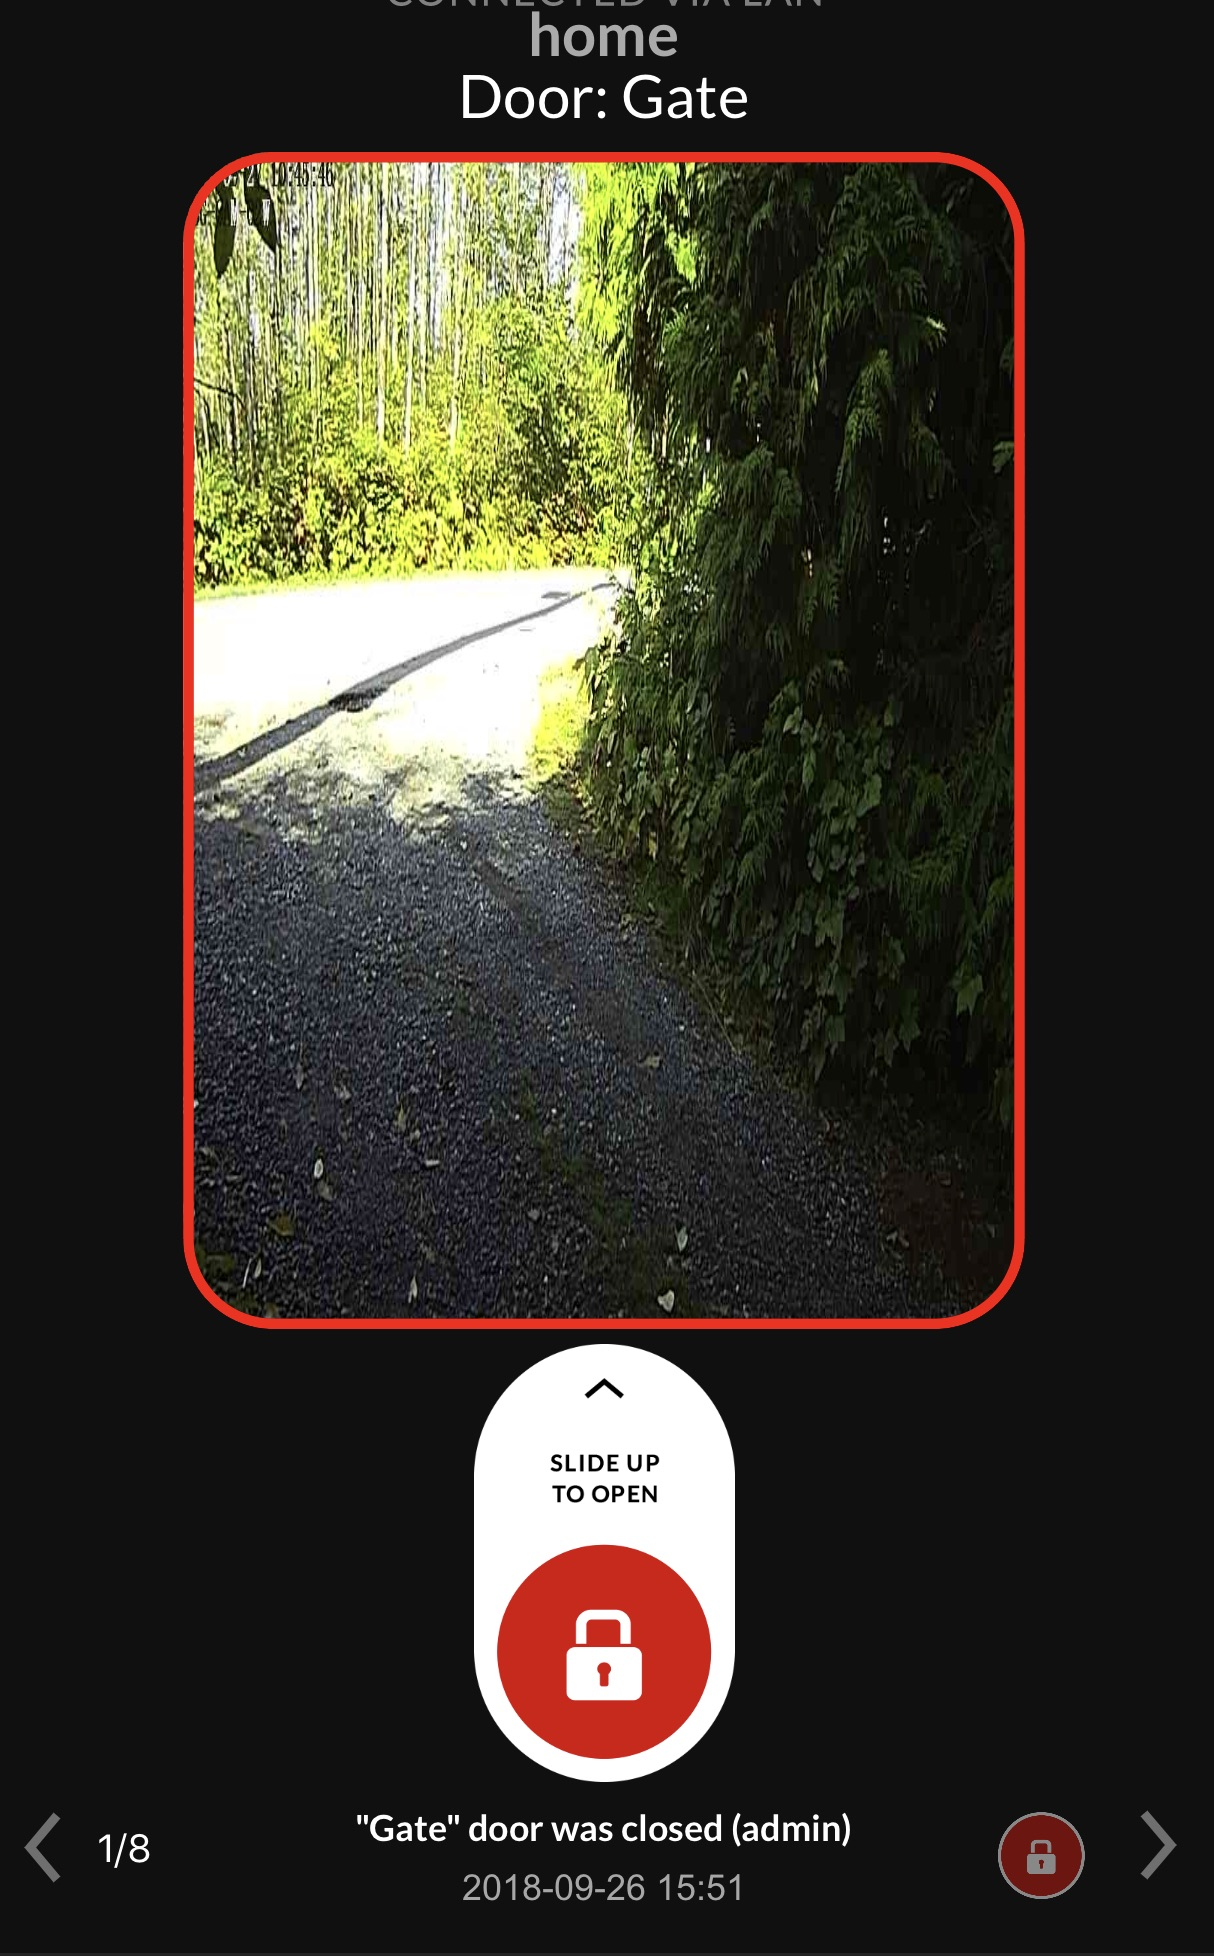 Gogogate 2 Wireless Gate Opener Review Best Buy Blog